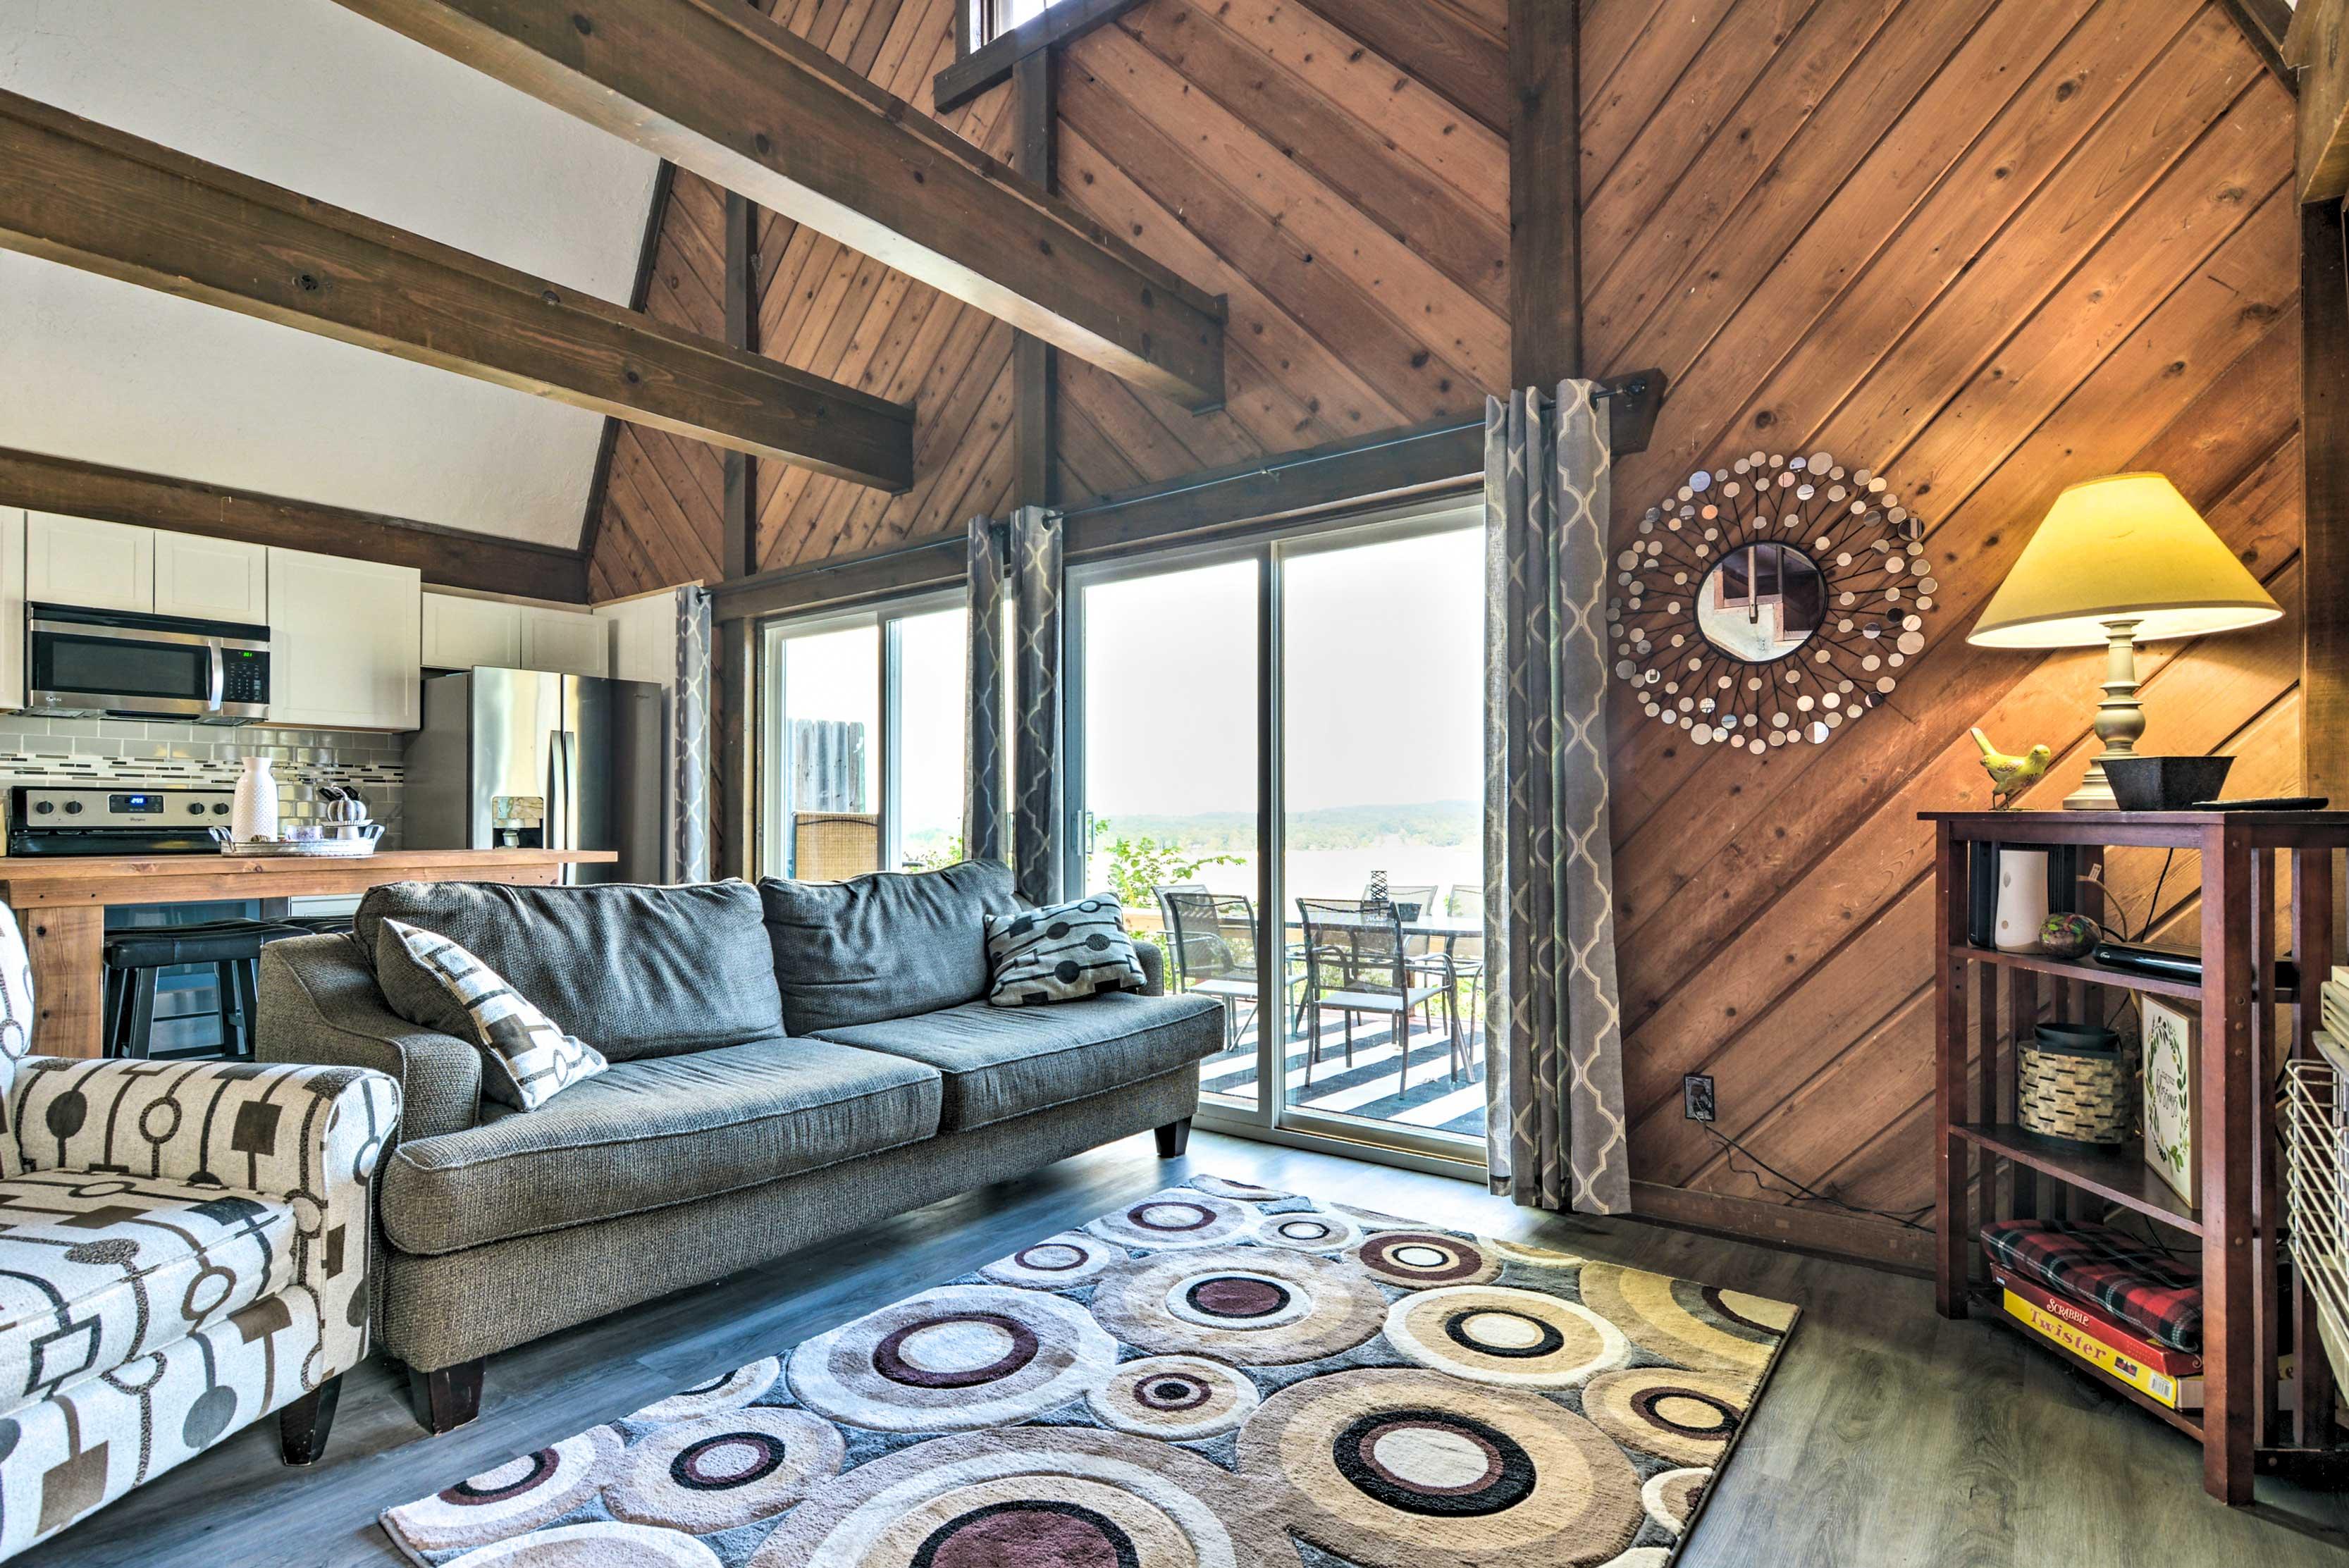 Living Room | Board Games